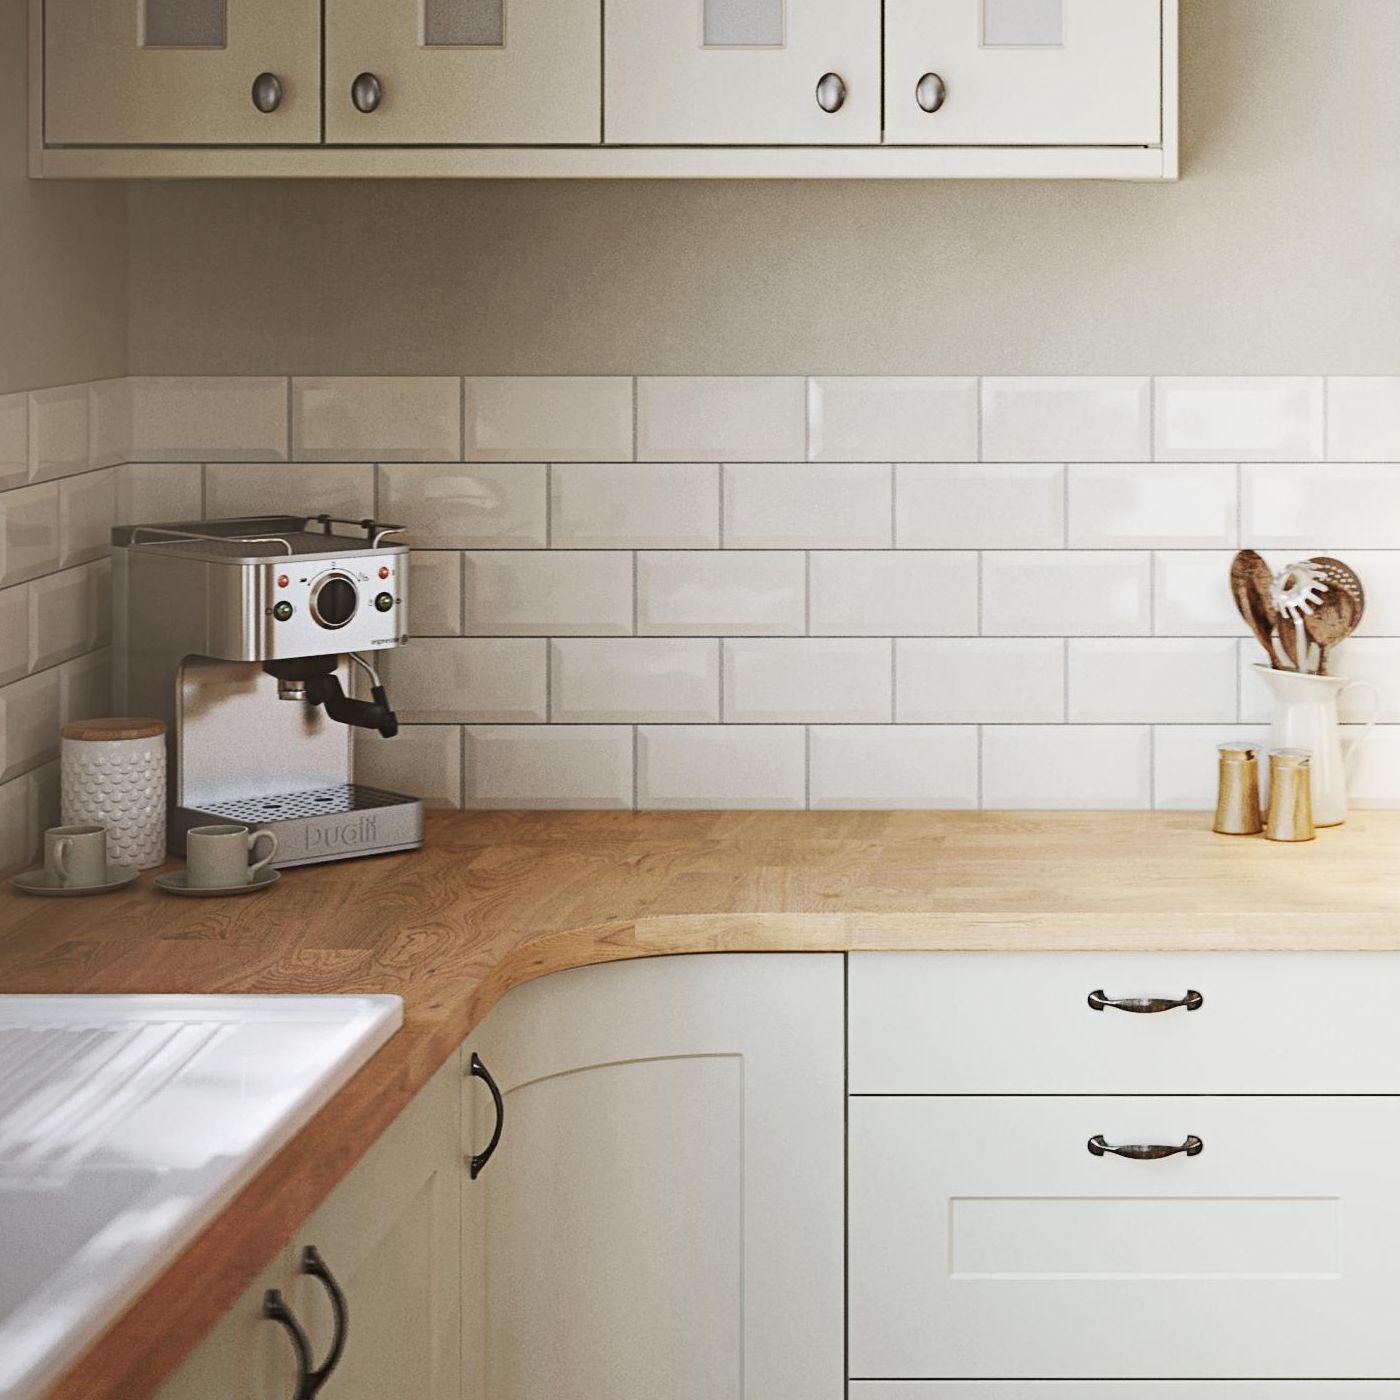 Country Kitchen Design Ideas Ideas Advice Diy At Bq